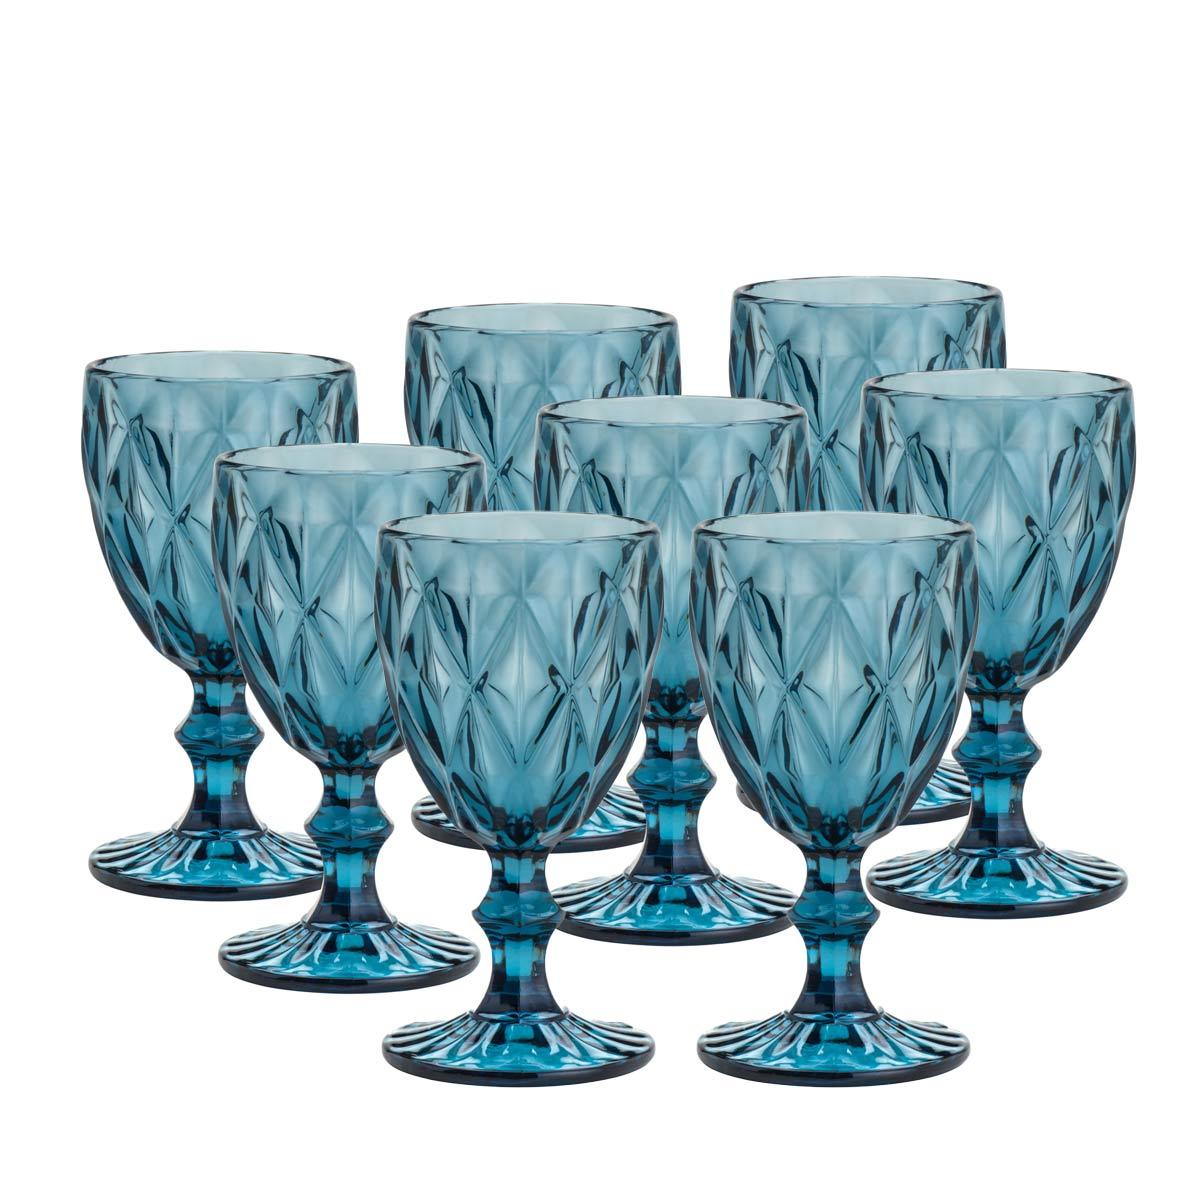 Jogo de 8 Taças Para Água Diamond Azul 260Ml Lyor  - Lemis